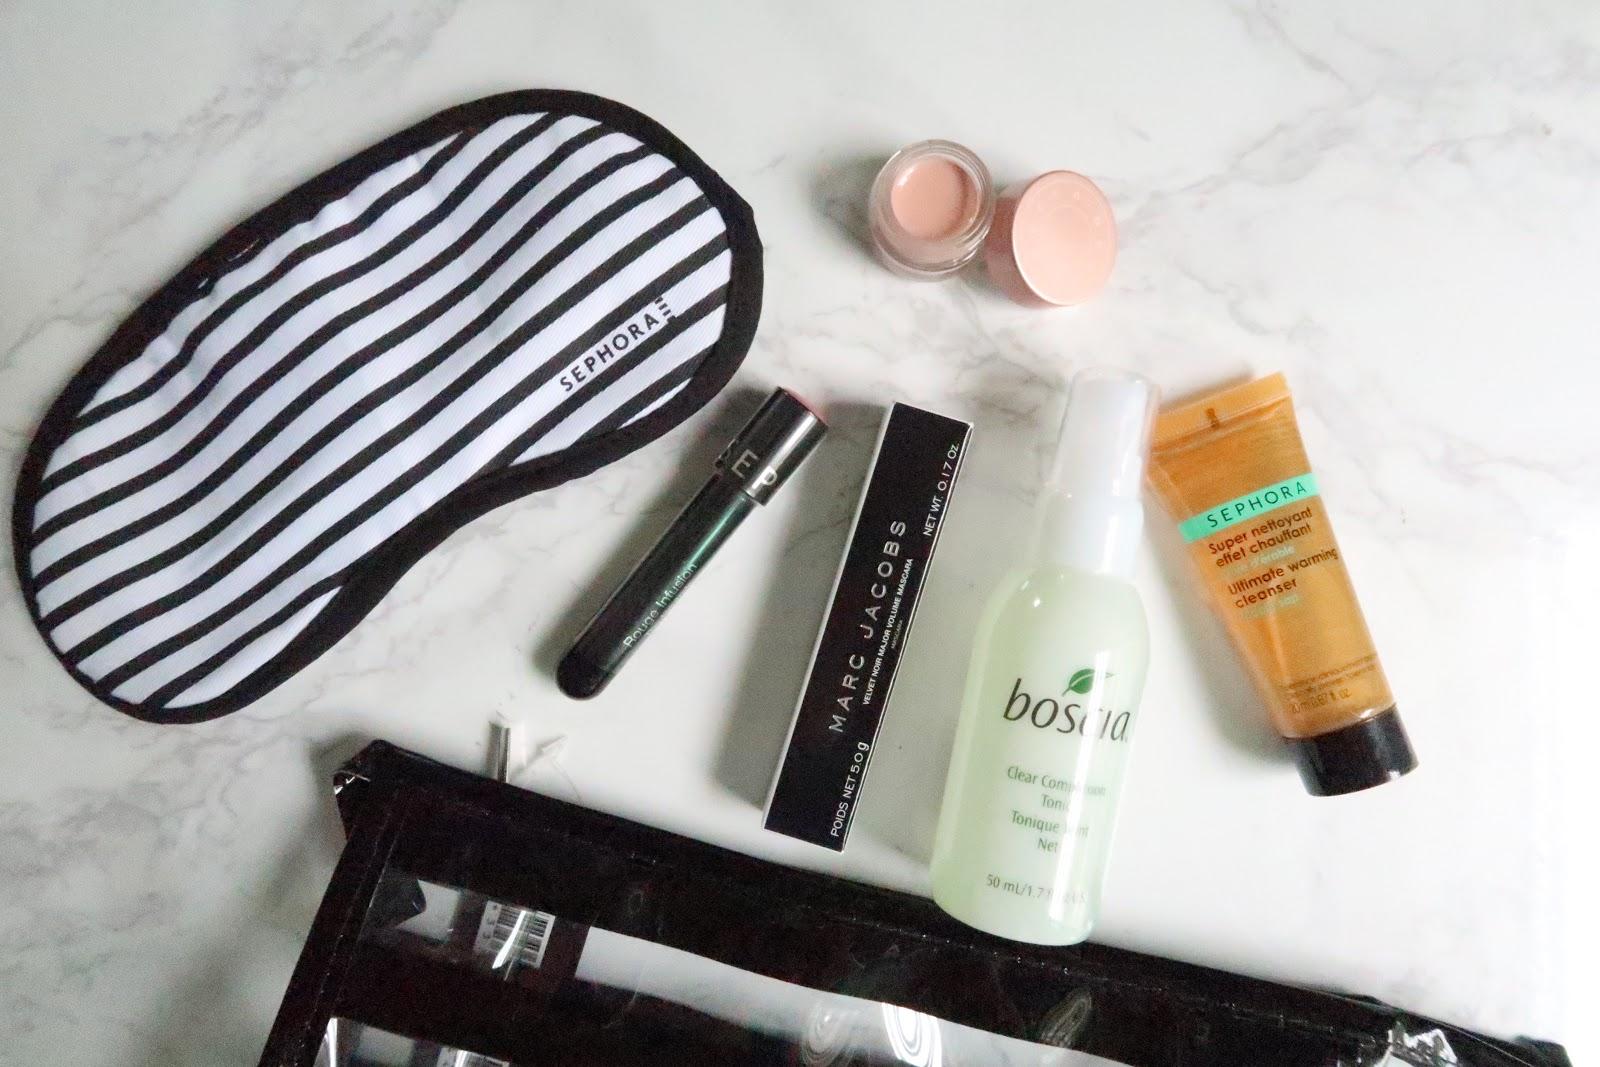 Sephora Waterproof Makeup Pouch